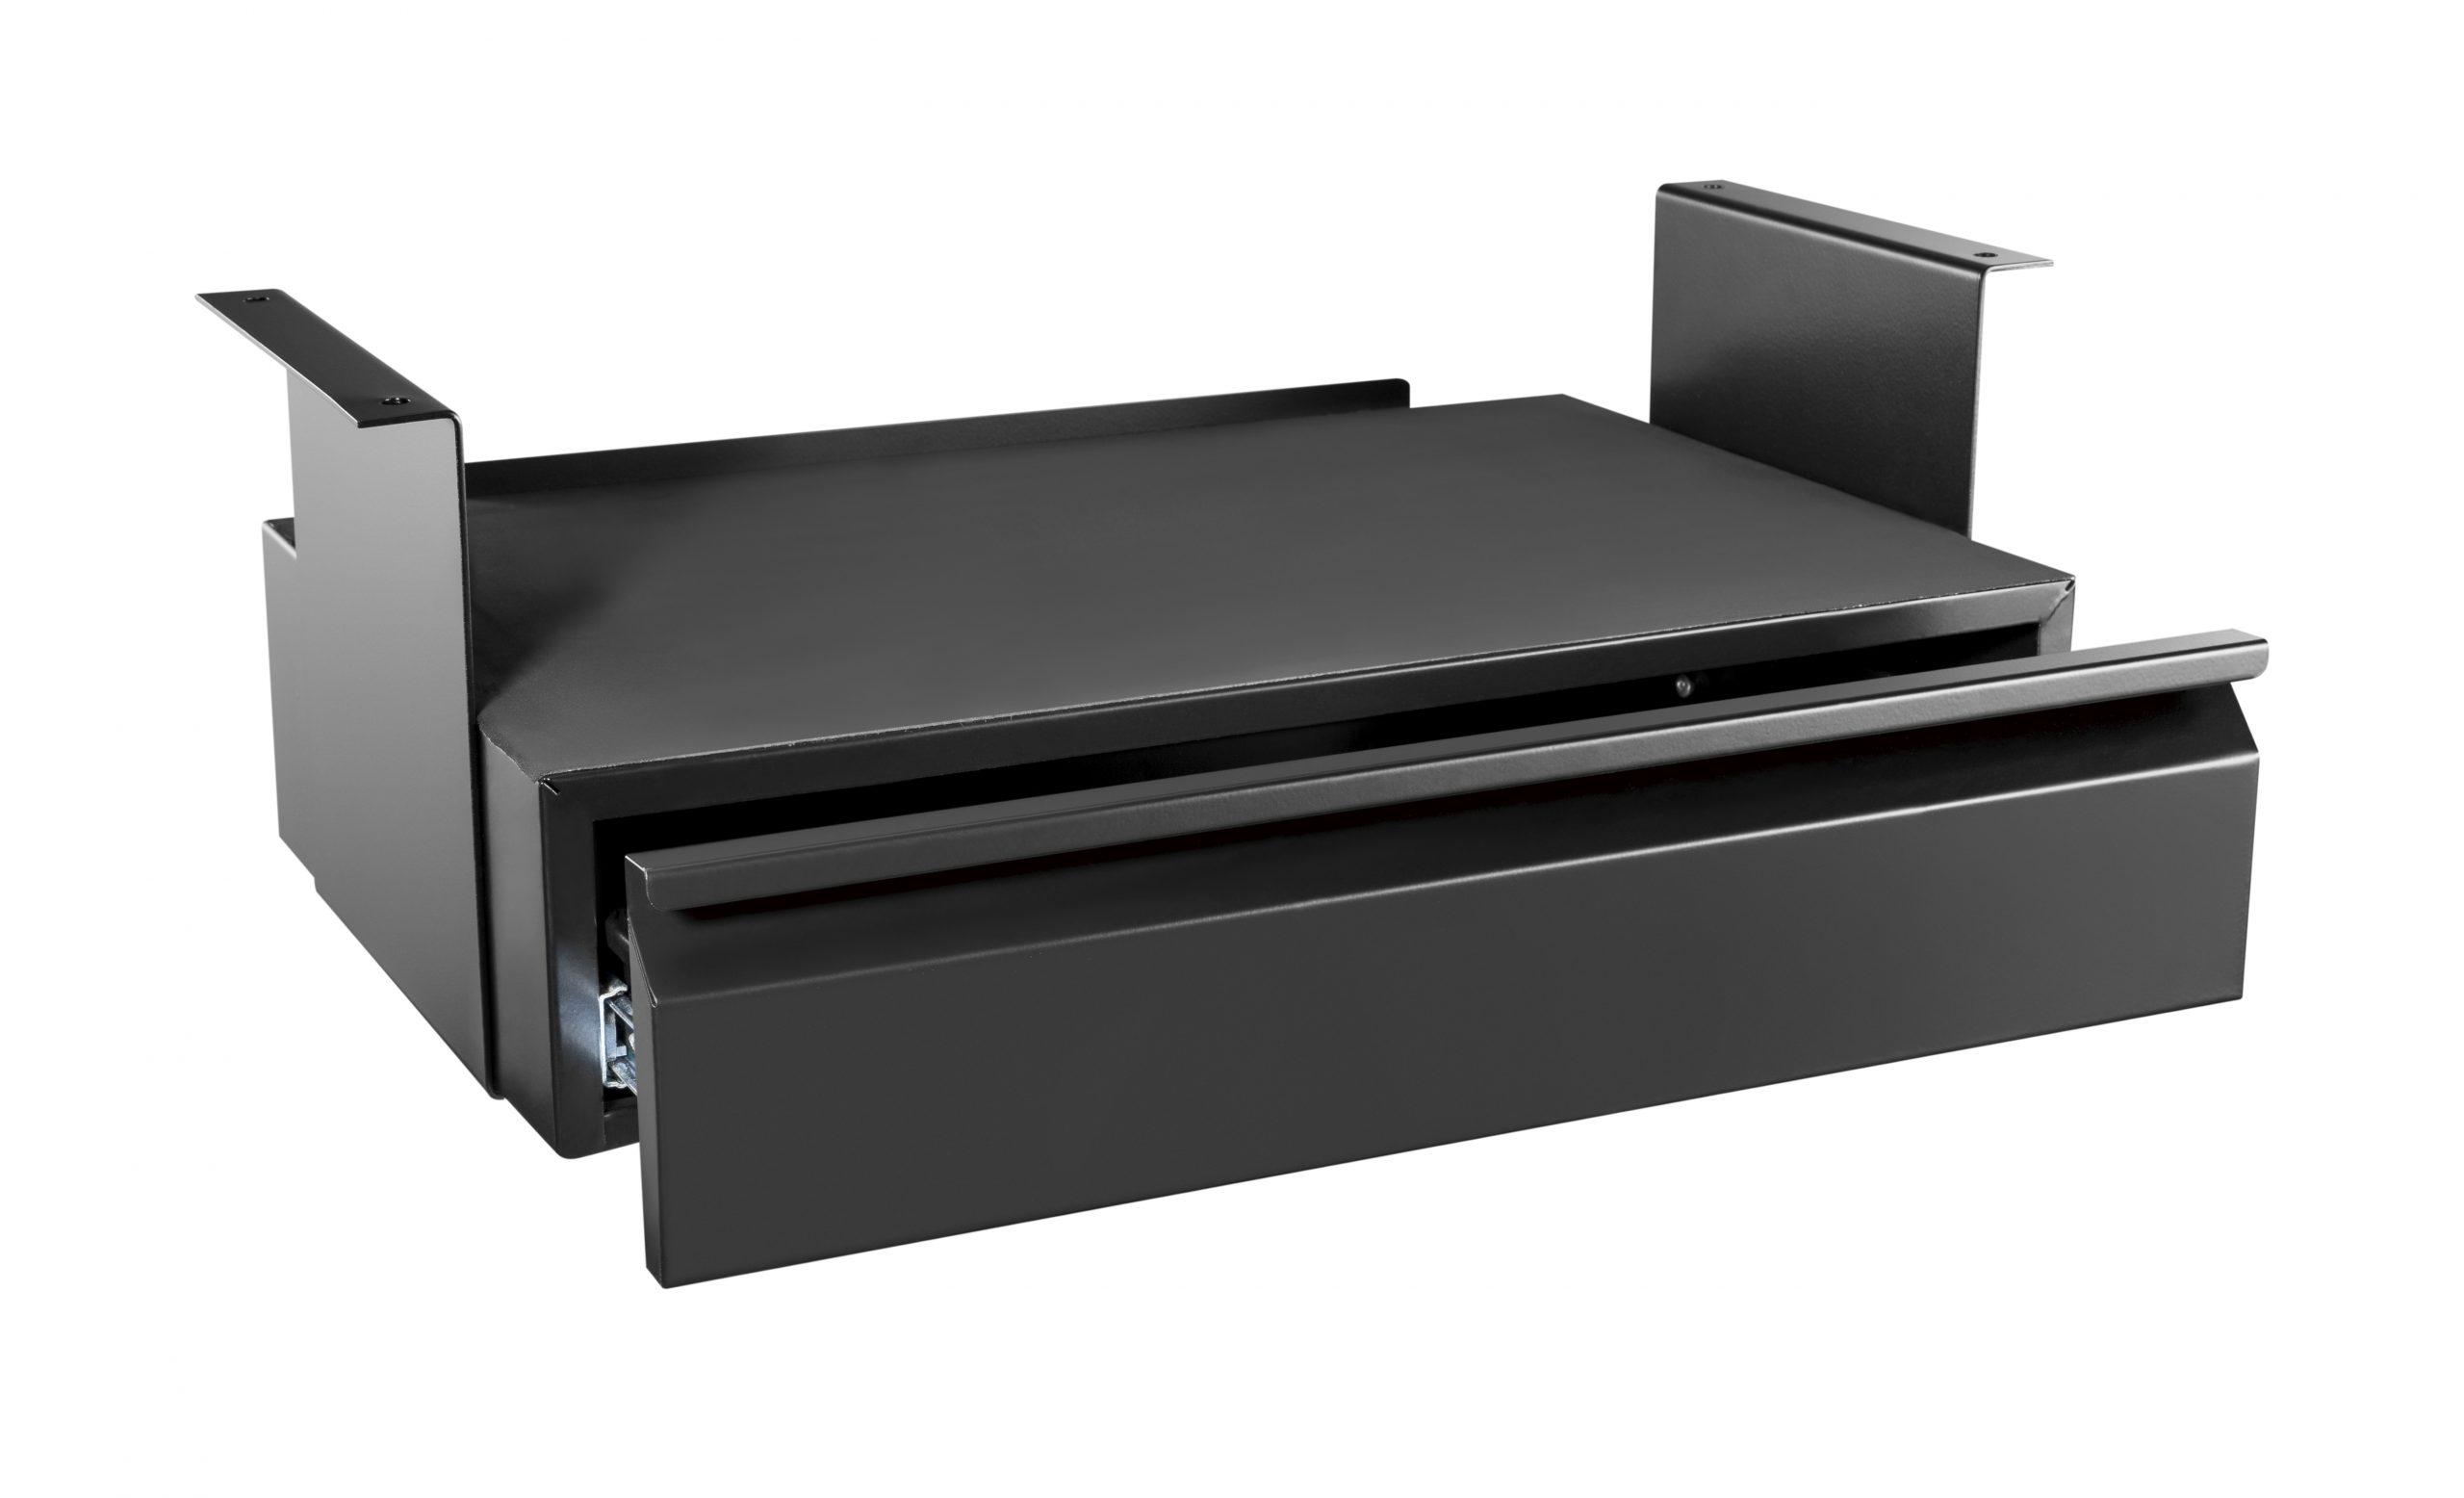 Allcam US022 Under-desk storage drawer & laptop shelf